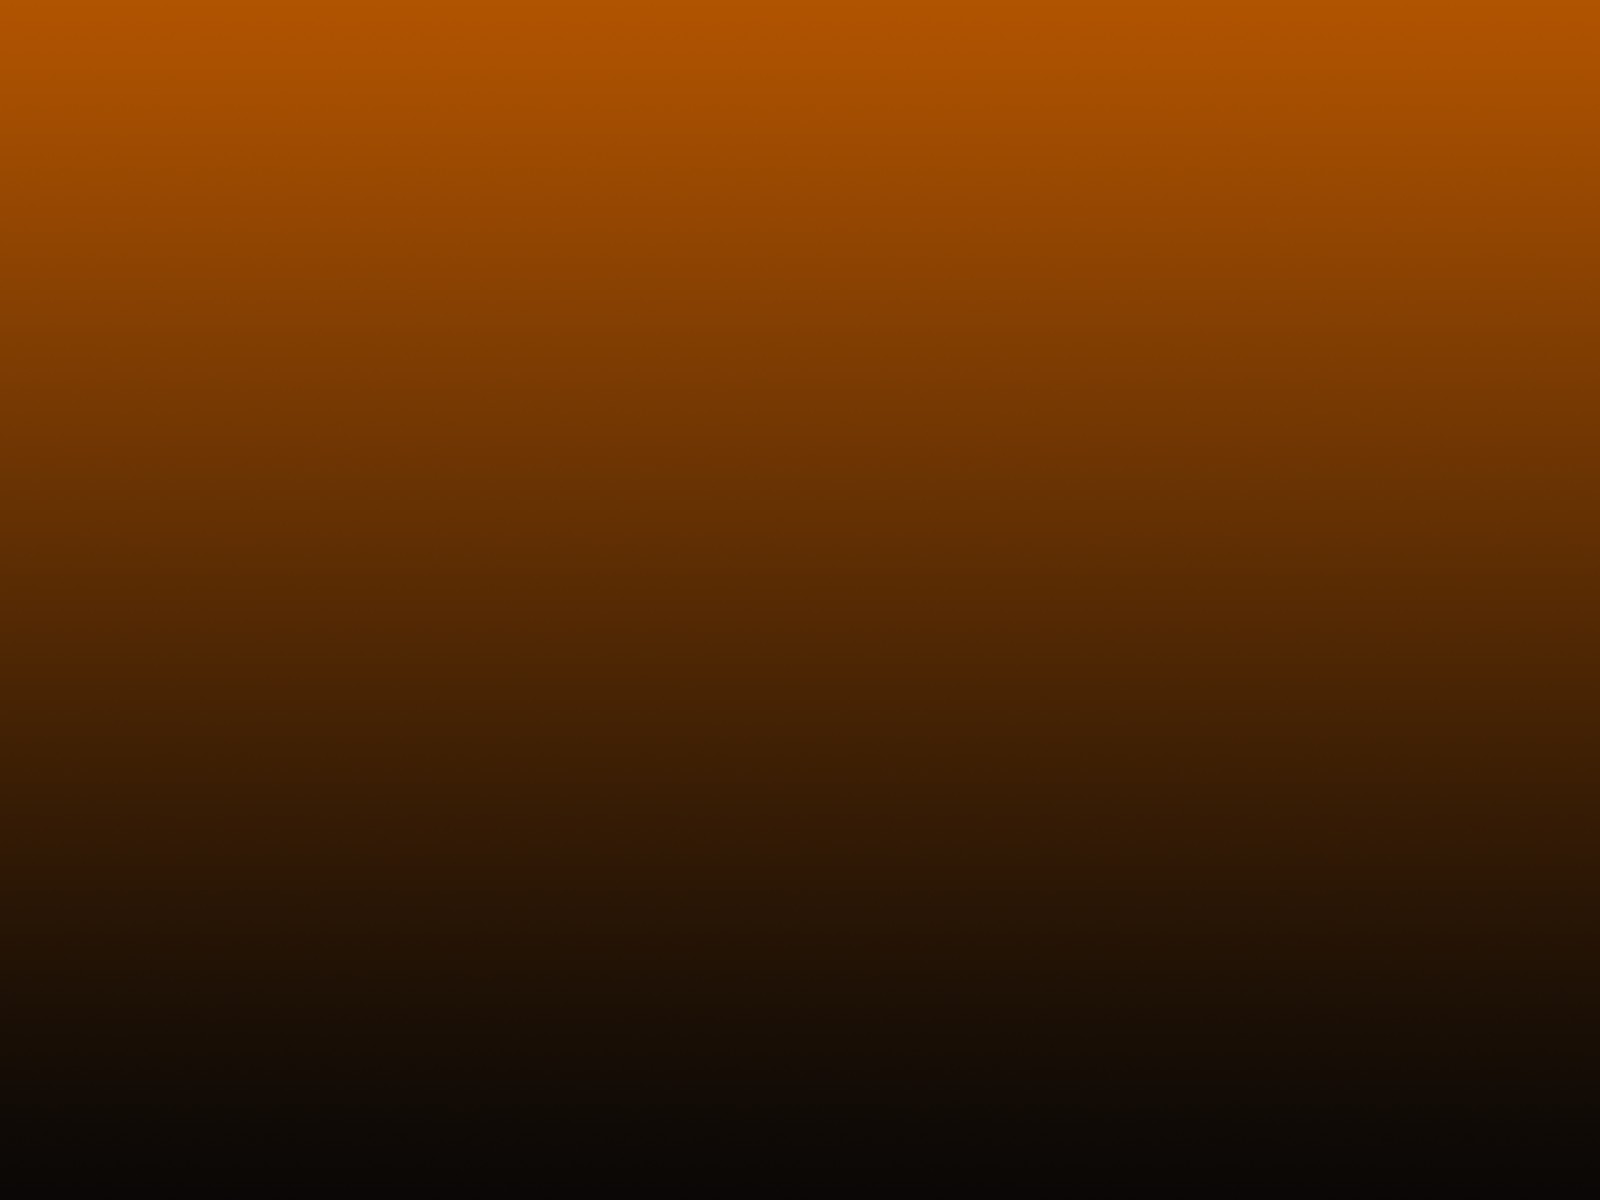 Black And Orange Wallpaper 08 1600x1200